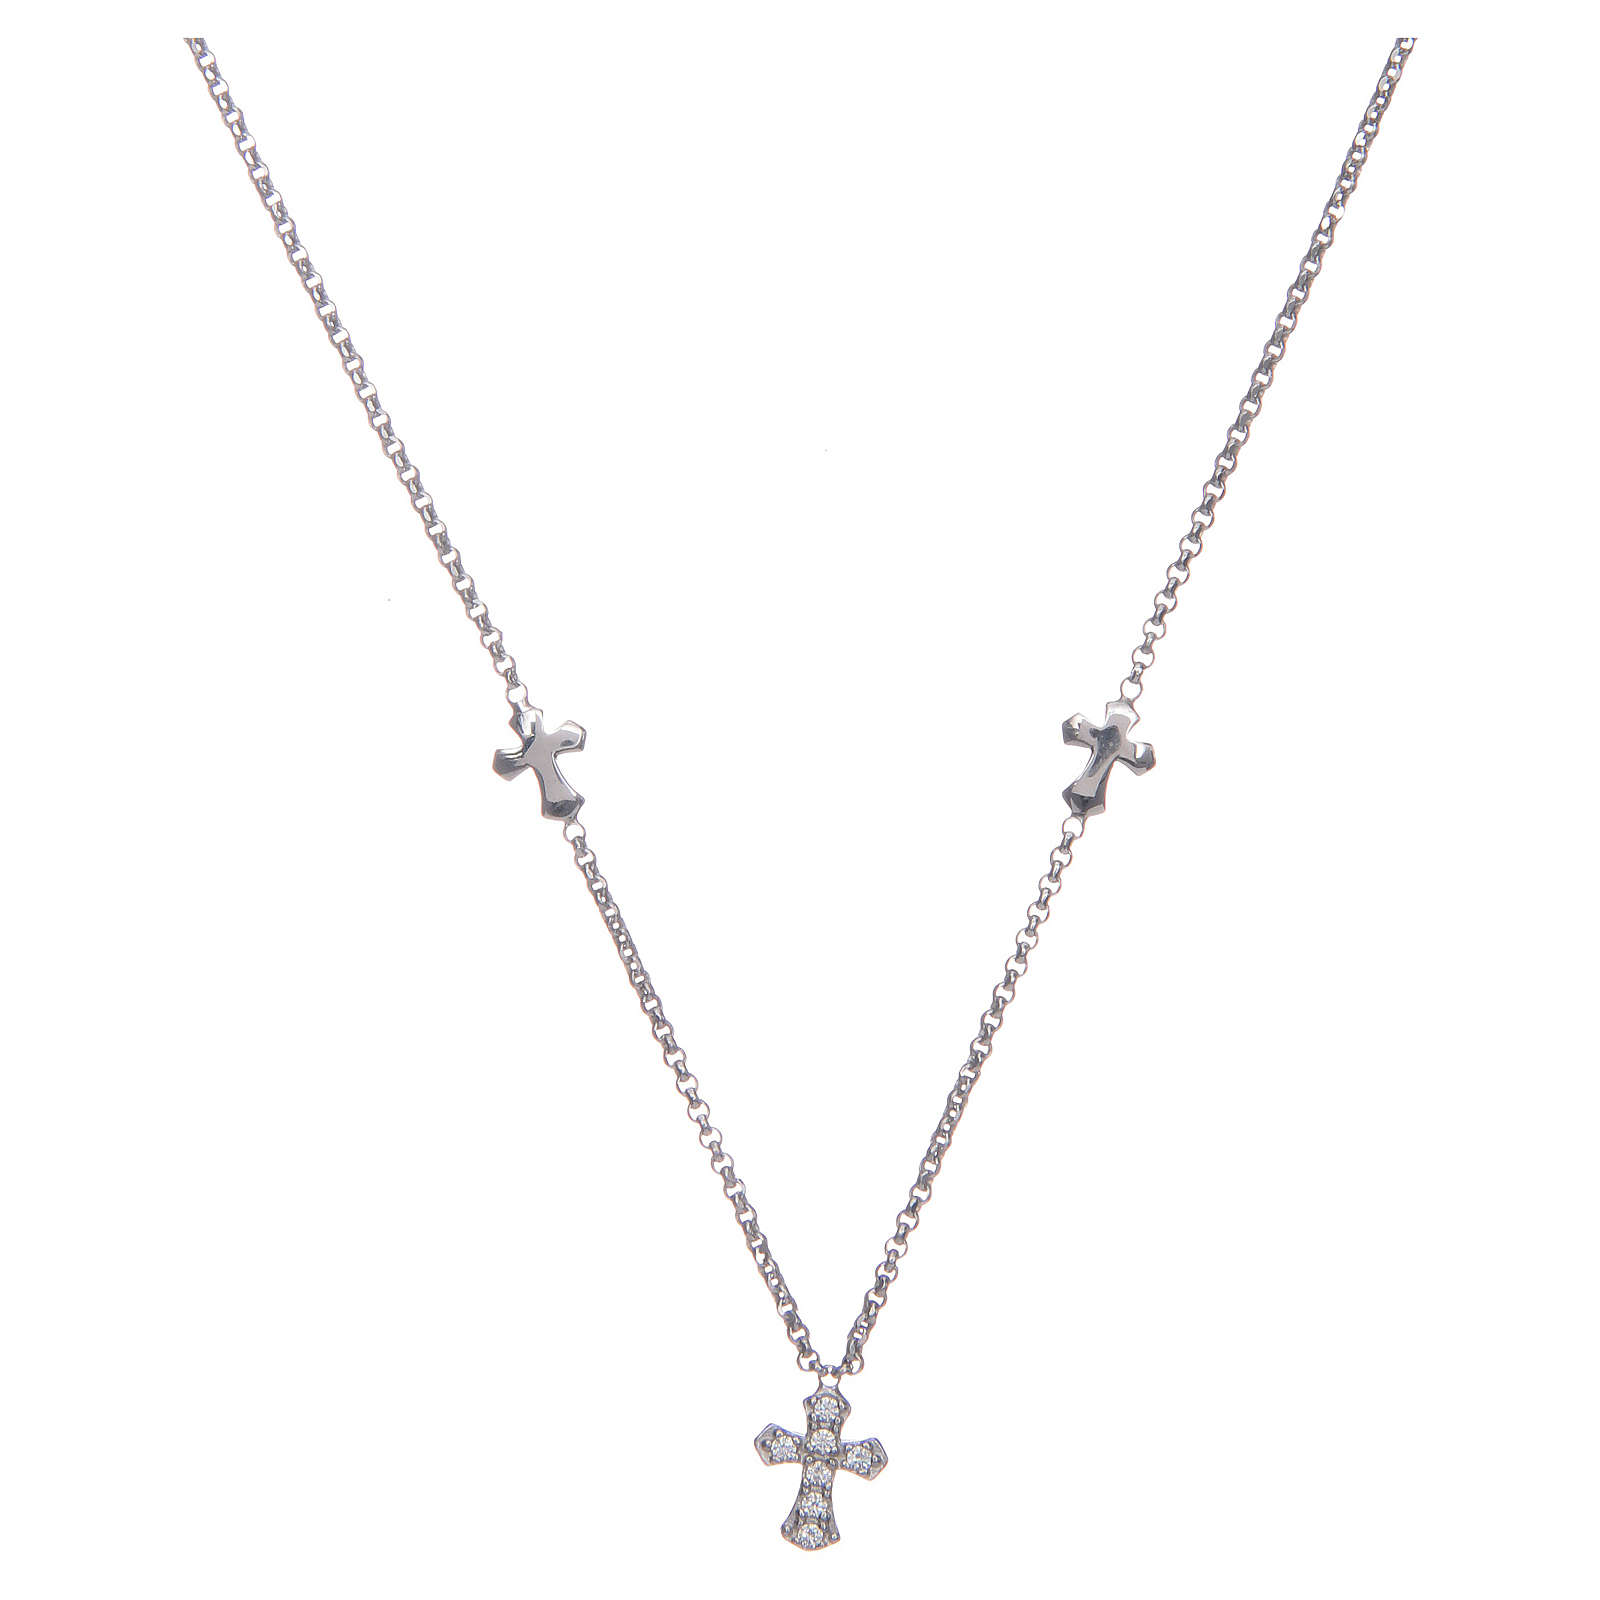 Kette AMEN Silber 925 Kreuzen 4